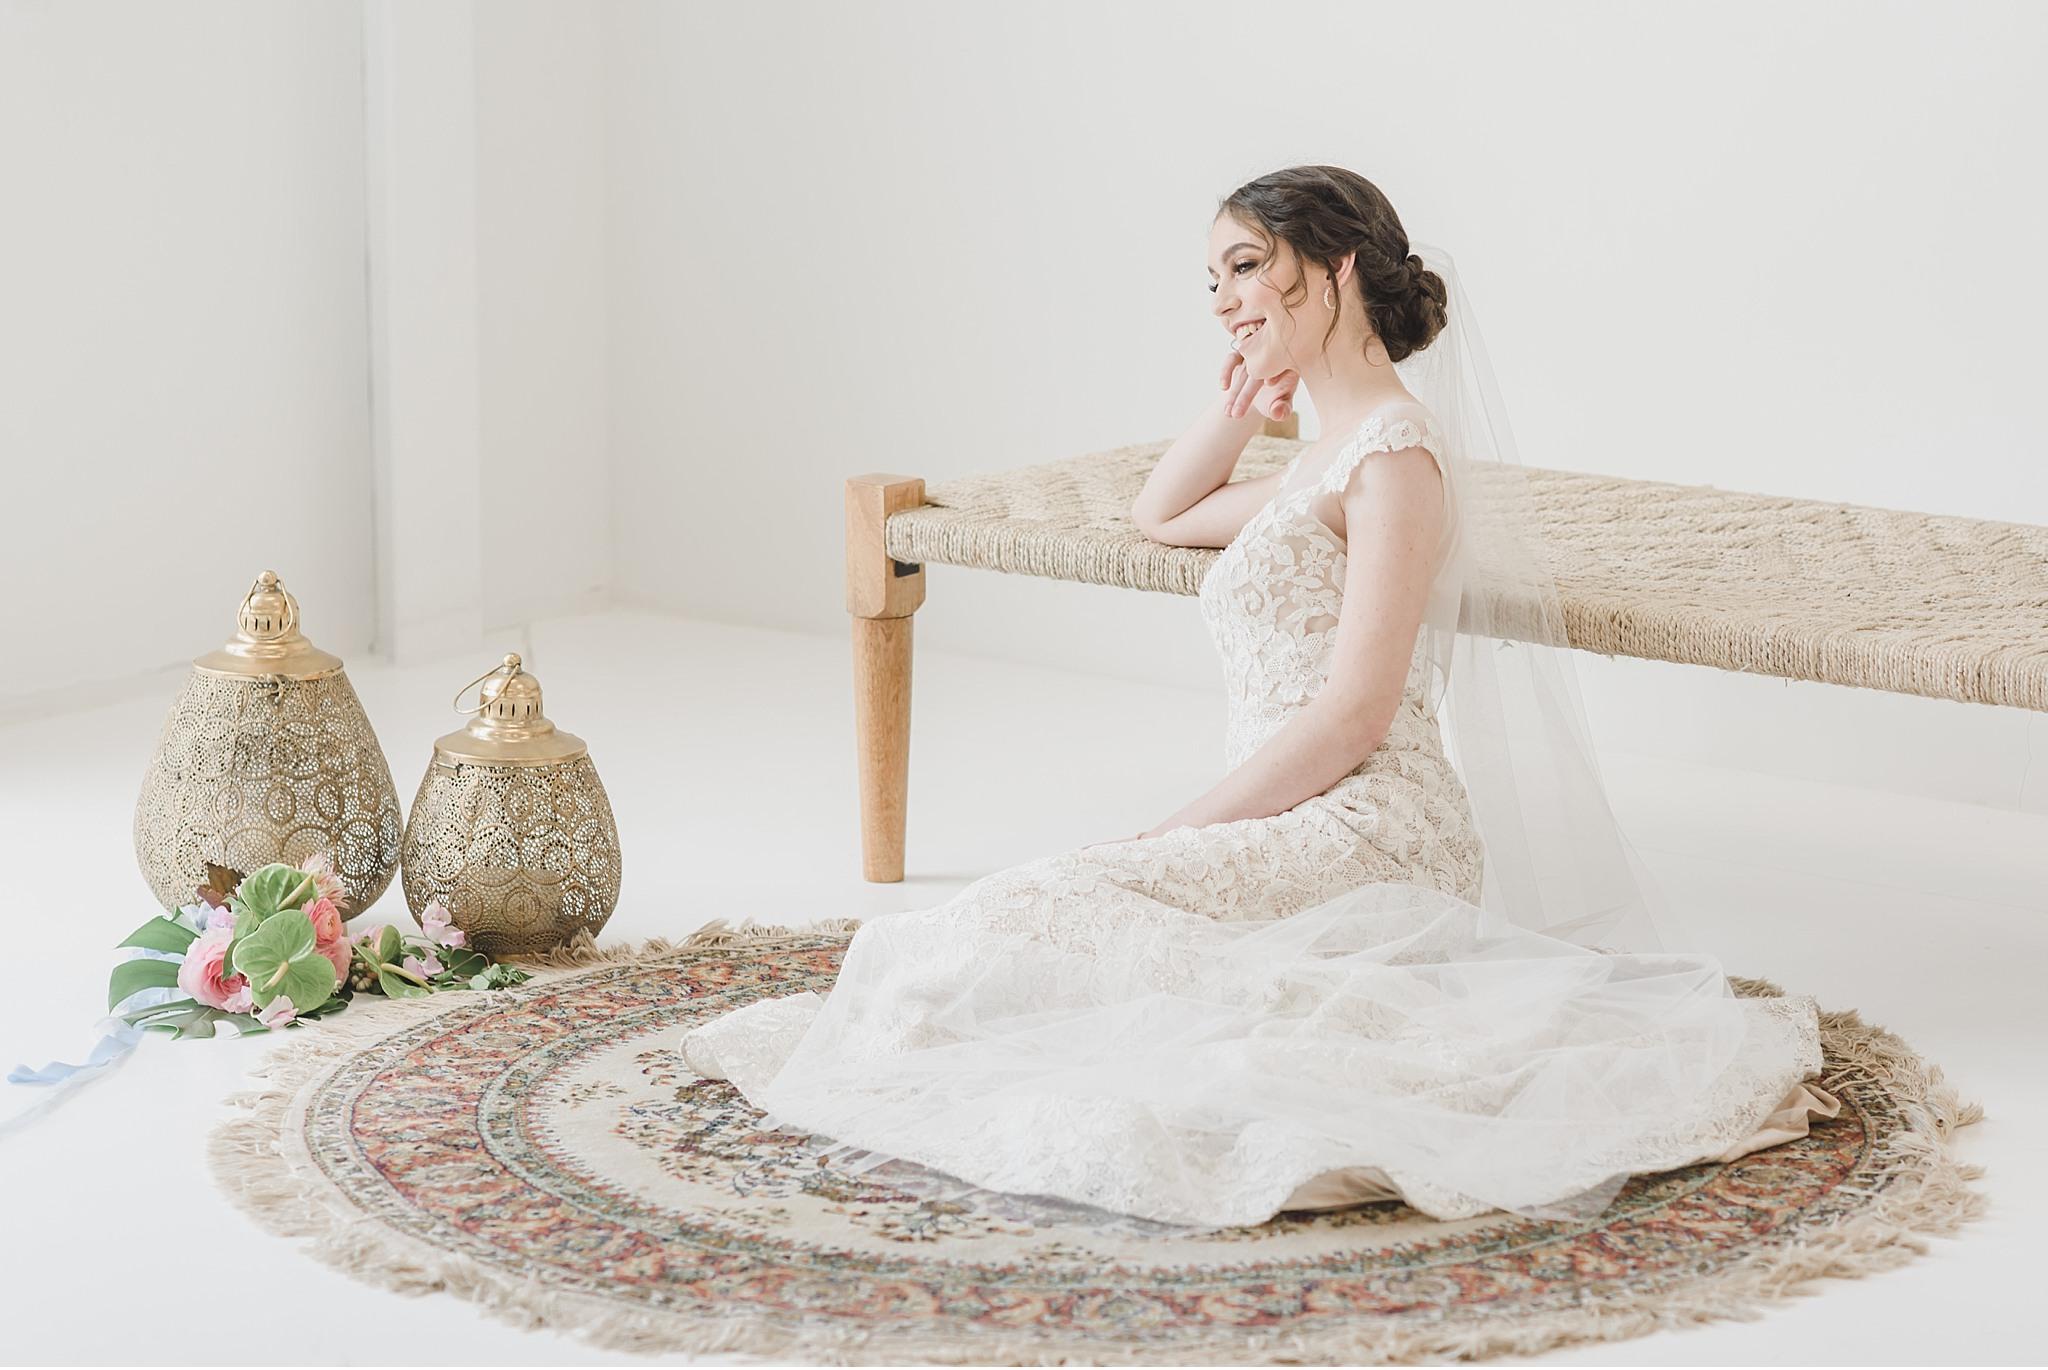 Beautiful Light and Airy Styled Greek Wedding Supply Manheim PA Wedding photography photo_1893.jpg